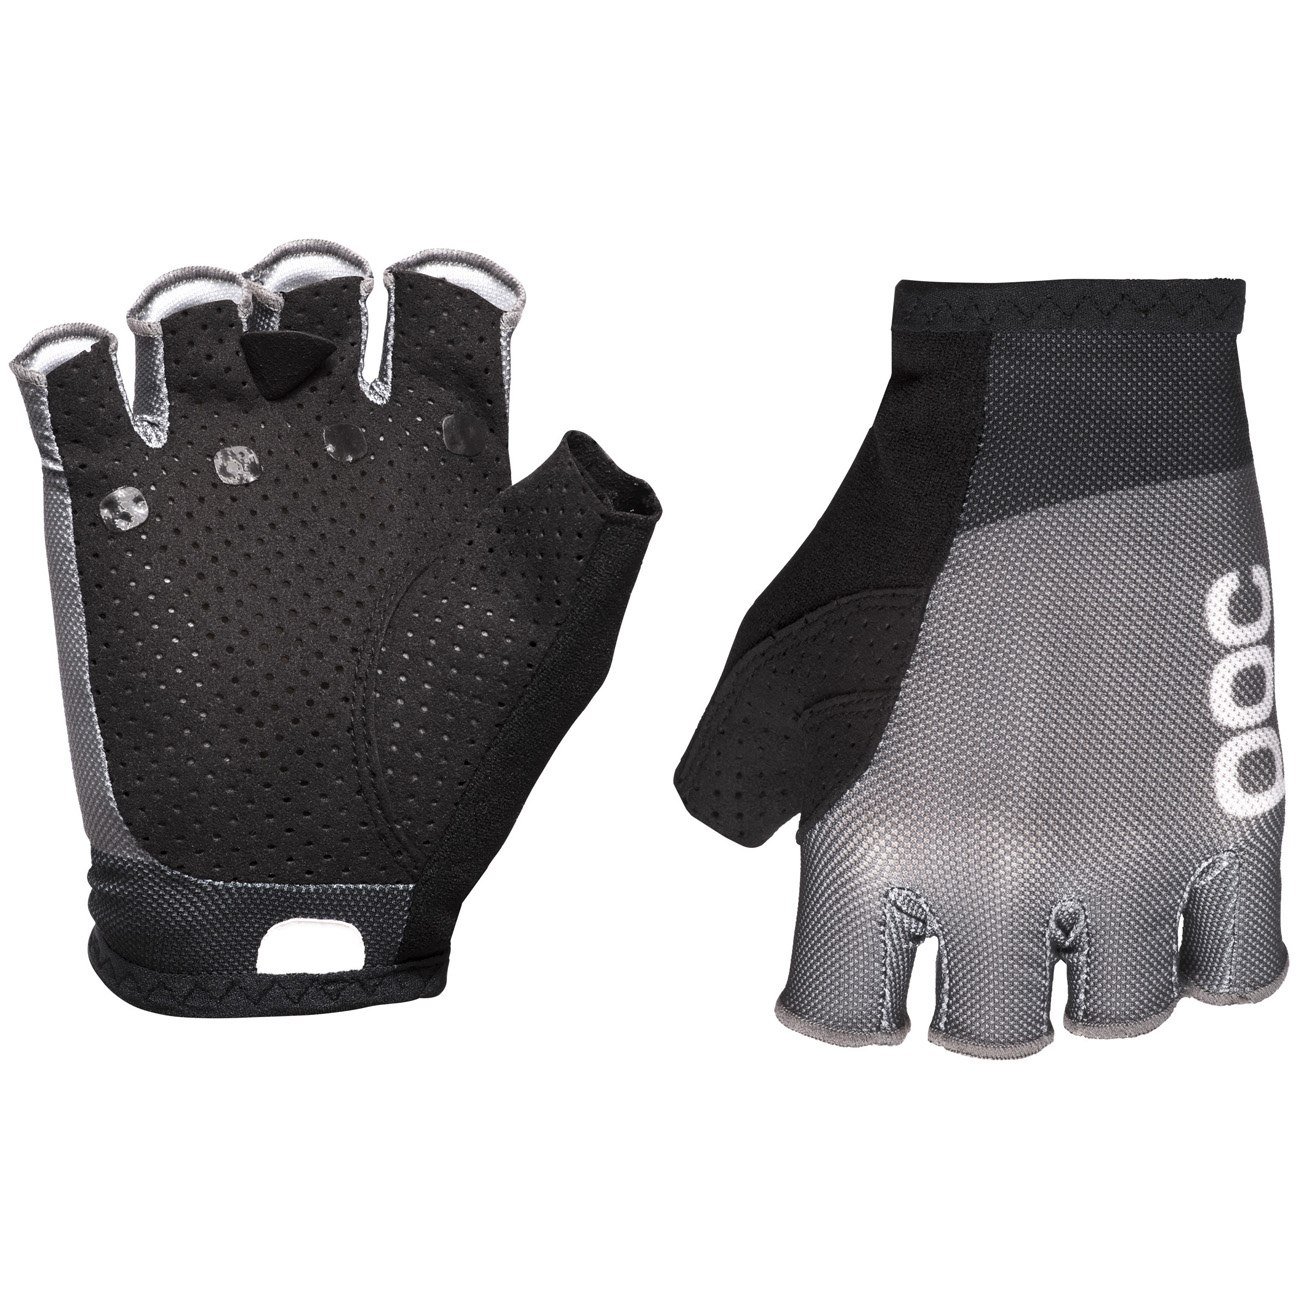 Foto de POC Essential Road Mesh Short Glove Short Finger Glove - 1002 Uranium black